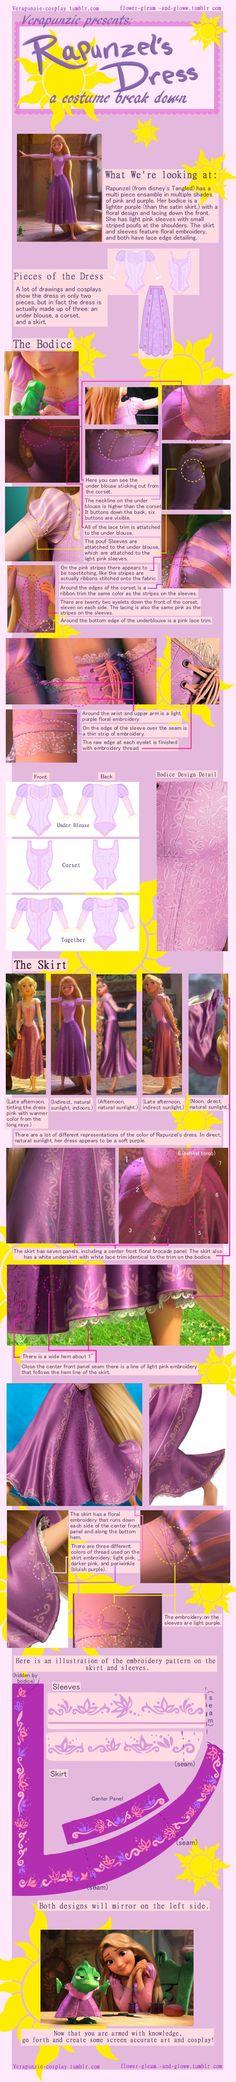 Rapunzel cosplay tips Rapunzel Cosplay, Rapunzel Dress, Tangled Rapunzel, Disney Rapunzel, Disney Cosplay, Disney Costumes, Disney Diy, Disney Crafts, Disney Princesses